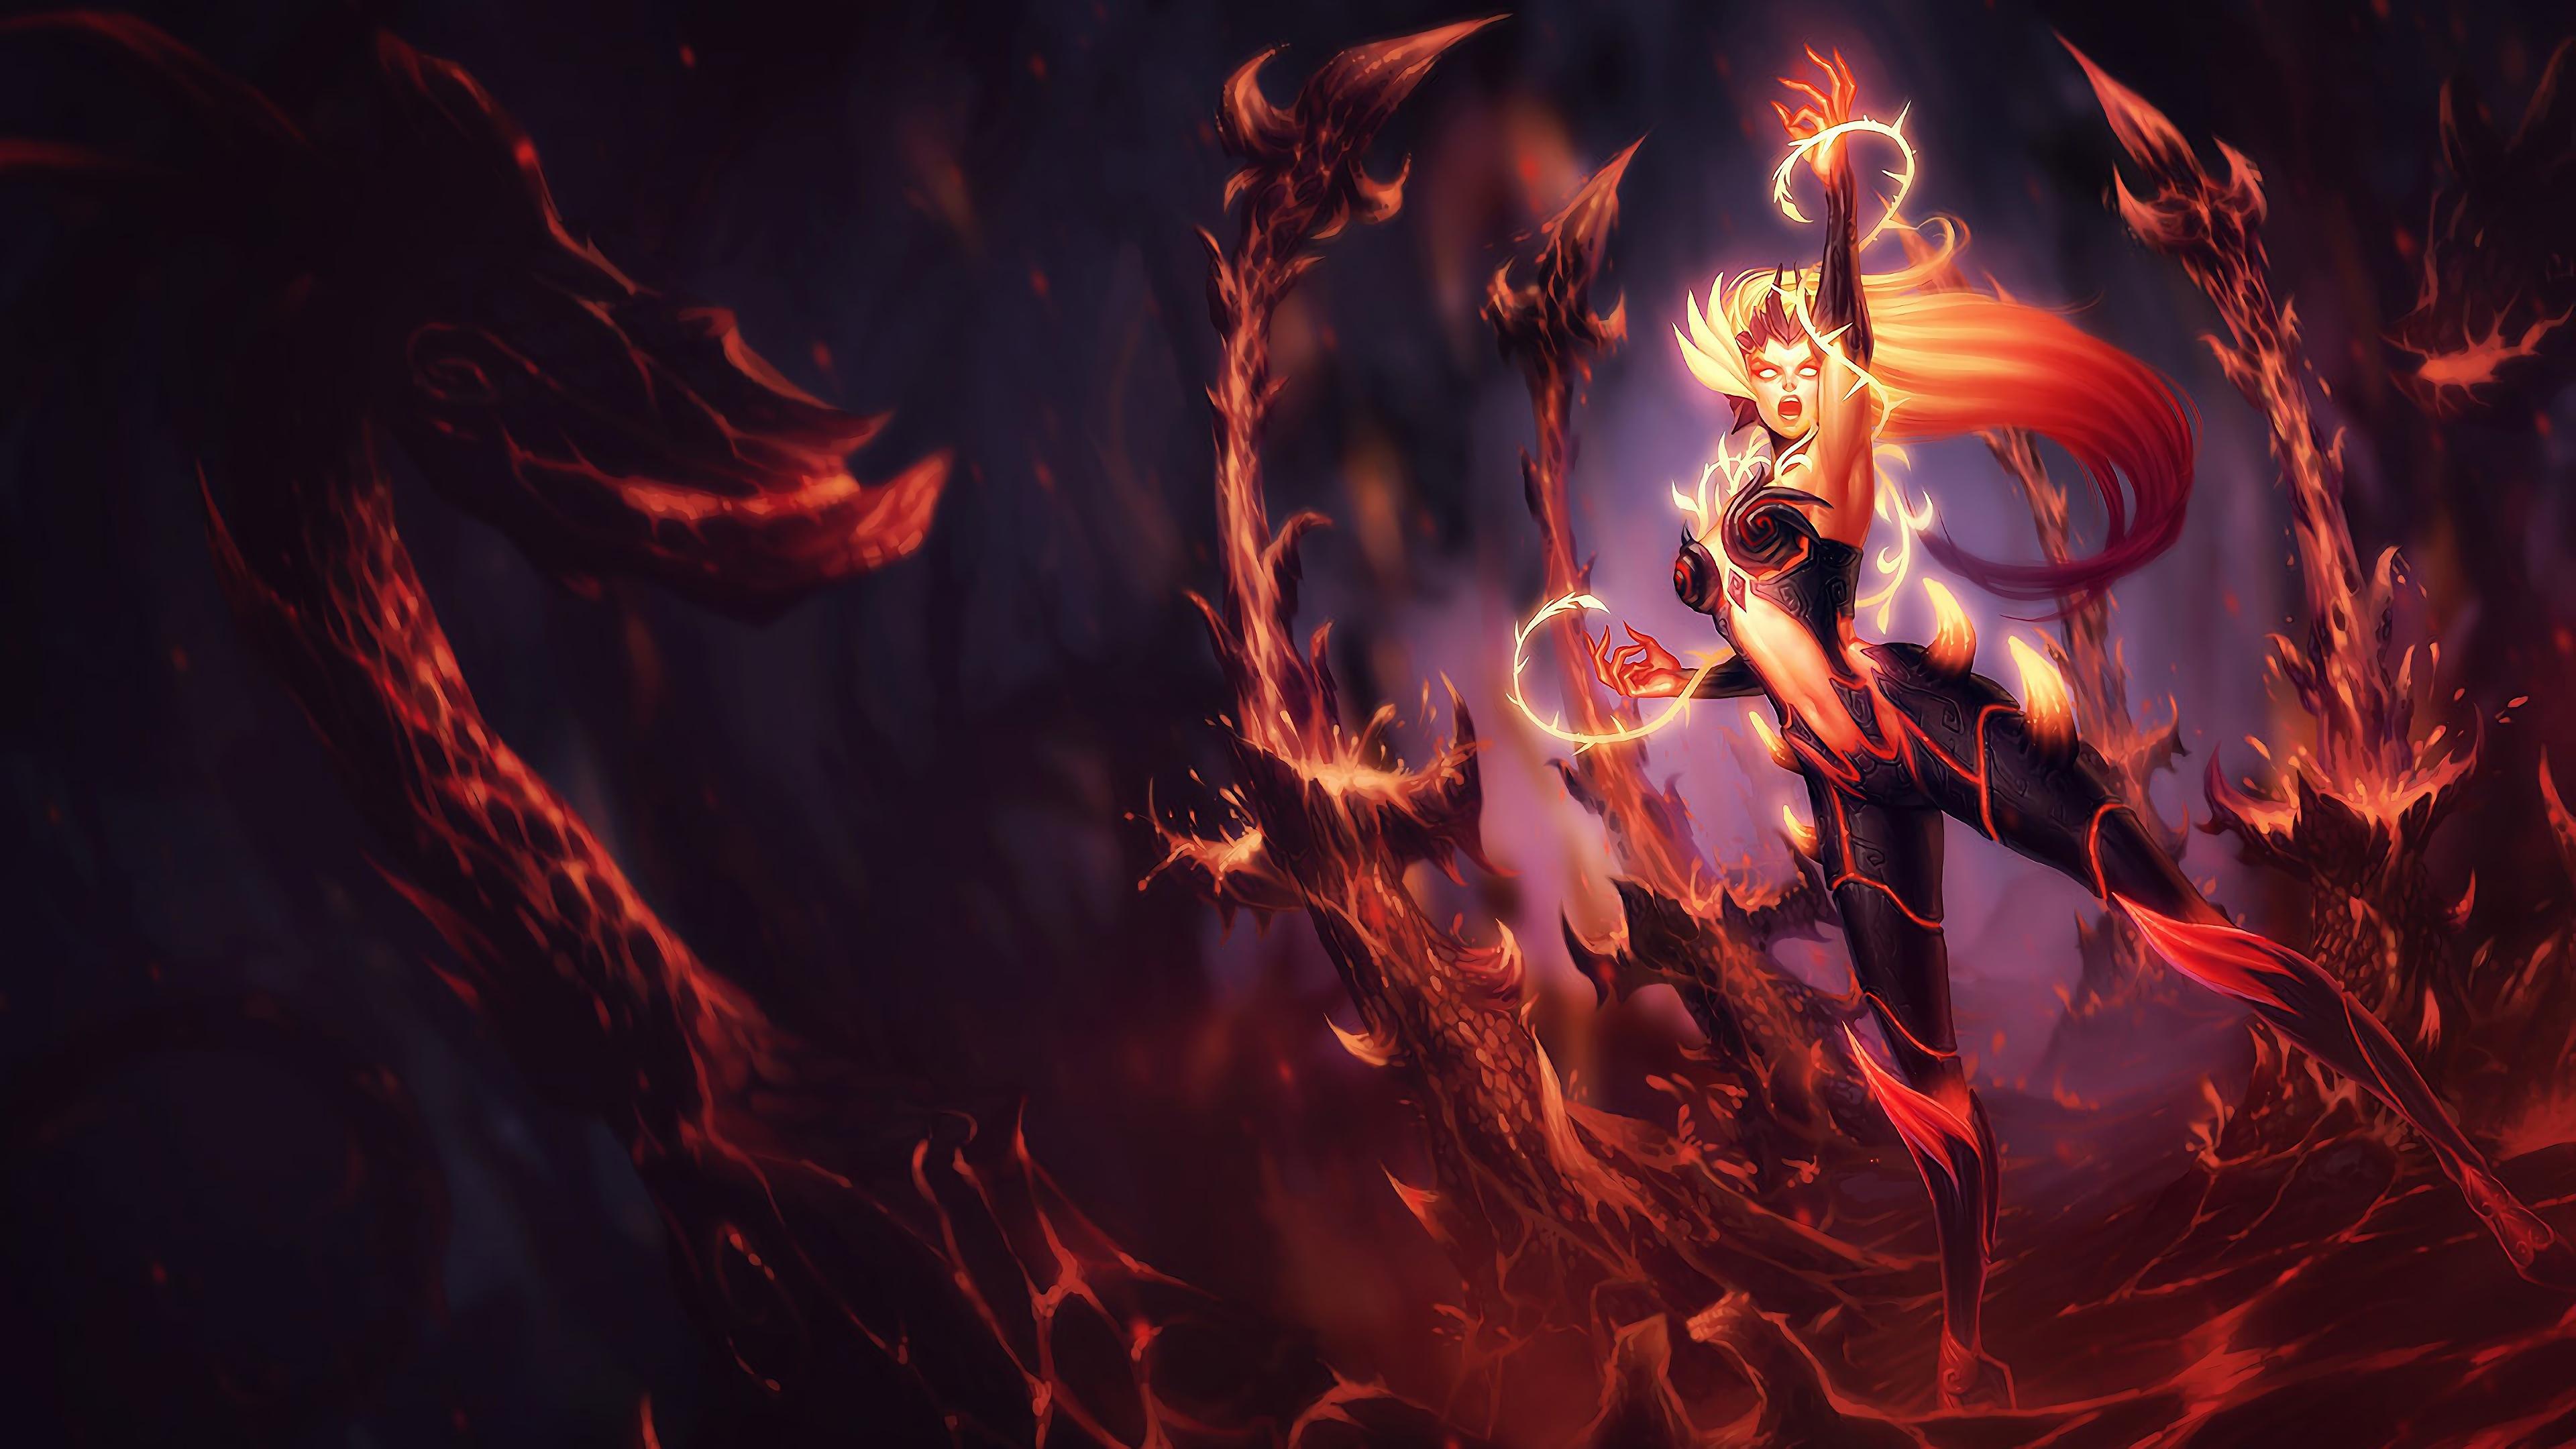 wildfire zyra lol splash art league of legends 1574099502 - Wildfire Zyra LoL Splash Art League of Legends - Zyra, league of legends